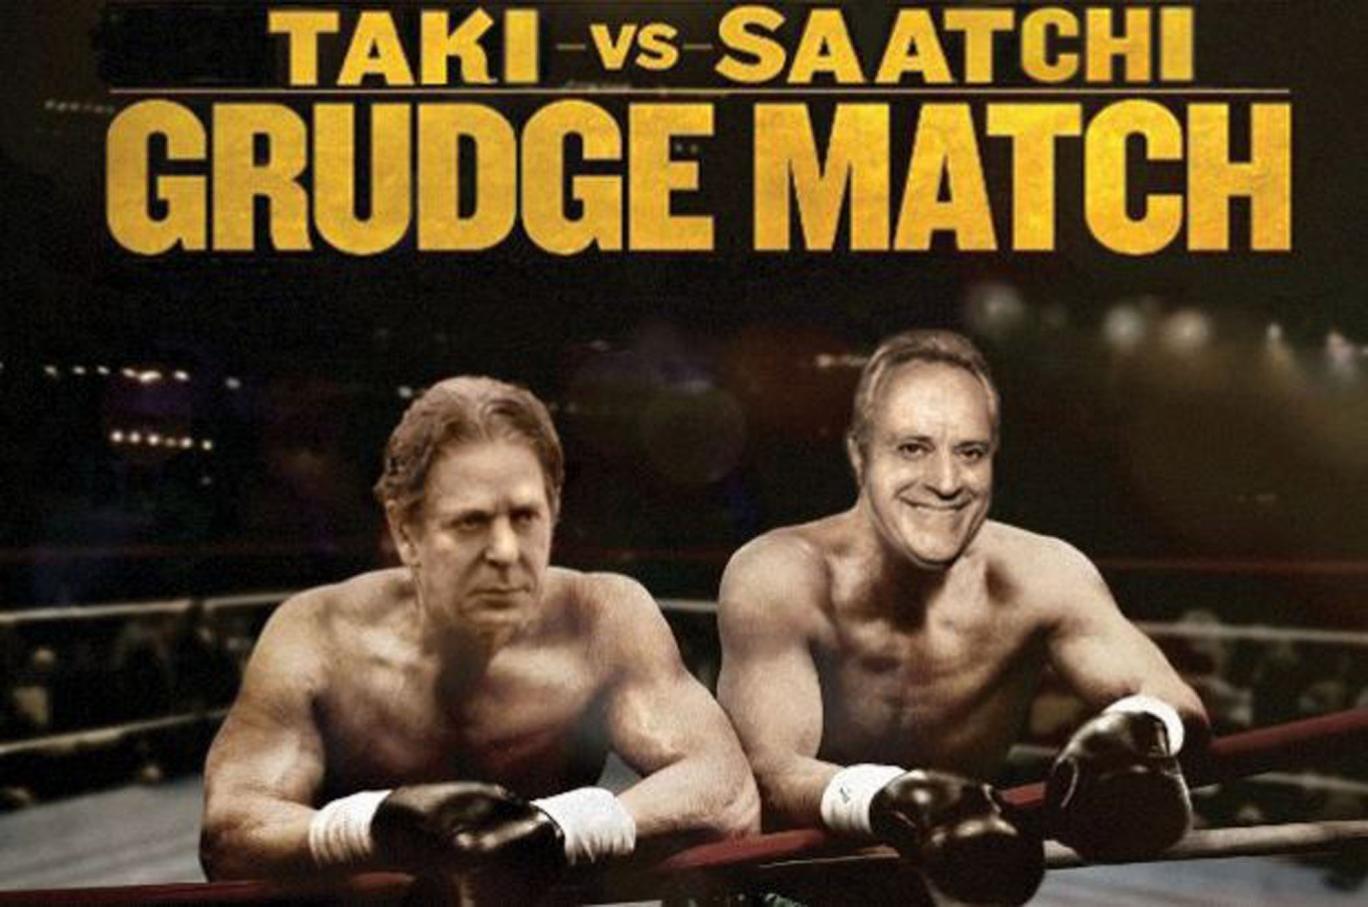 Charles Saatchi challenges Spectator journalist Taki to a cage fight after Nigella column